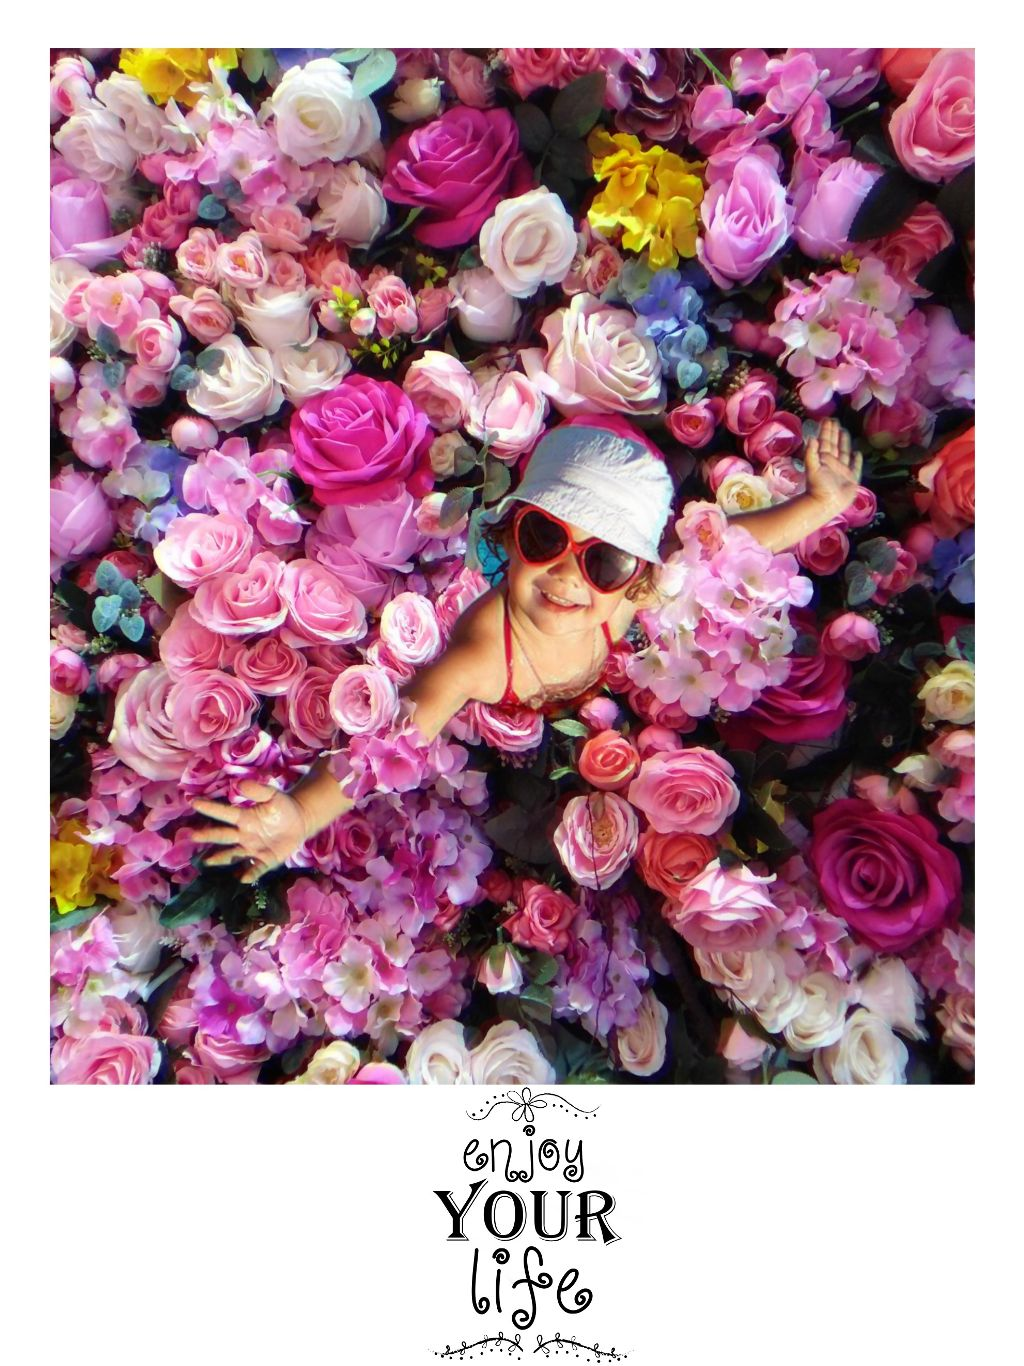 #freetoedit#polaroid#flower#flowerpower#kid#swimming#sweet#enjoy#life#beutiful#cool#lol#mrlb2000#myart#myedit#sweety#like @pa @freetoedit